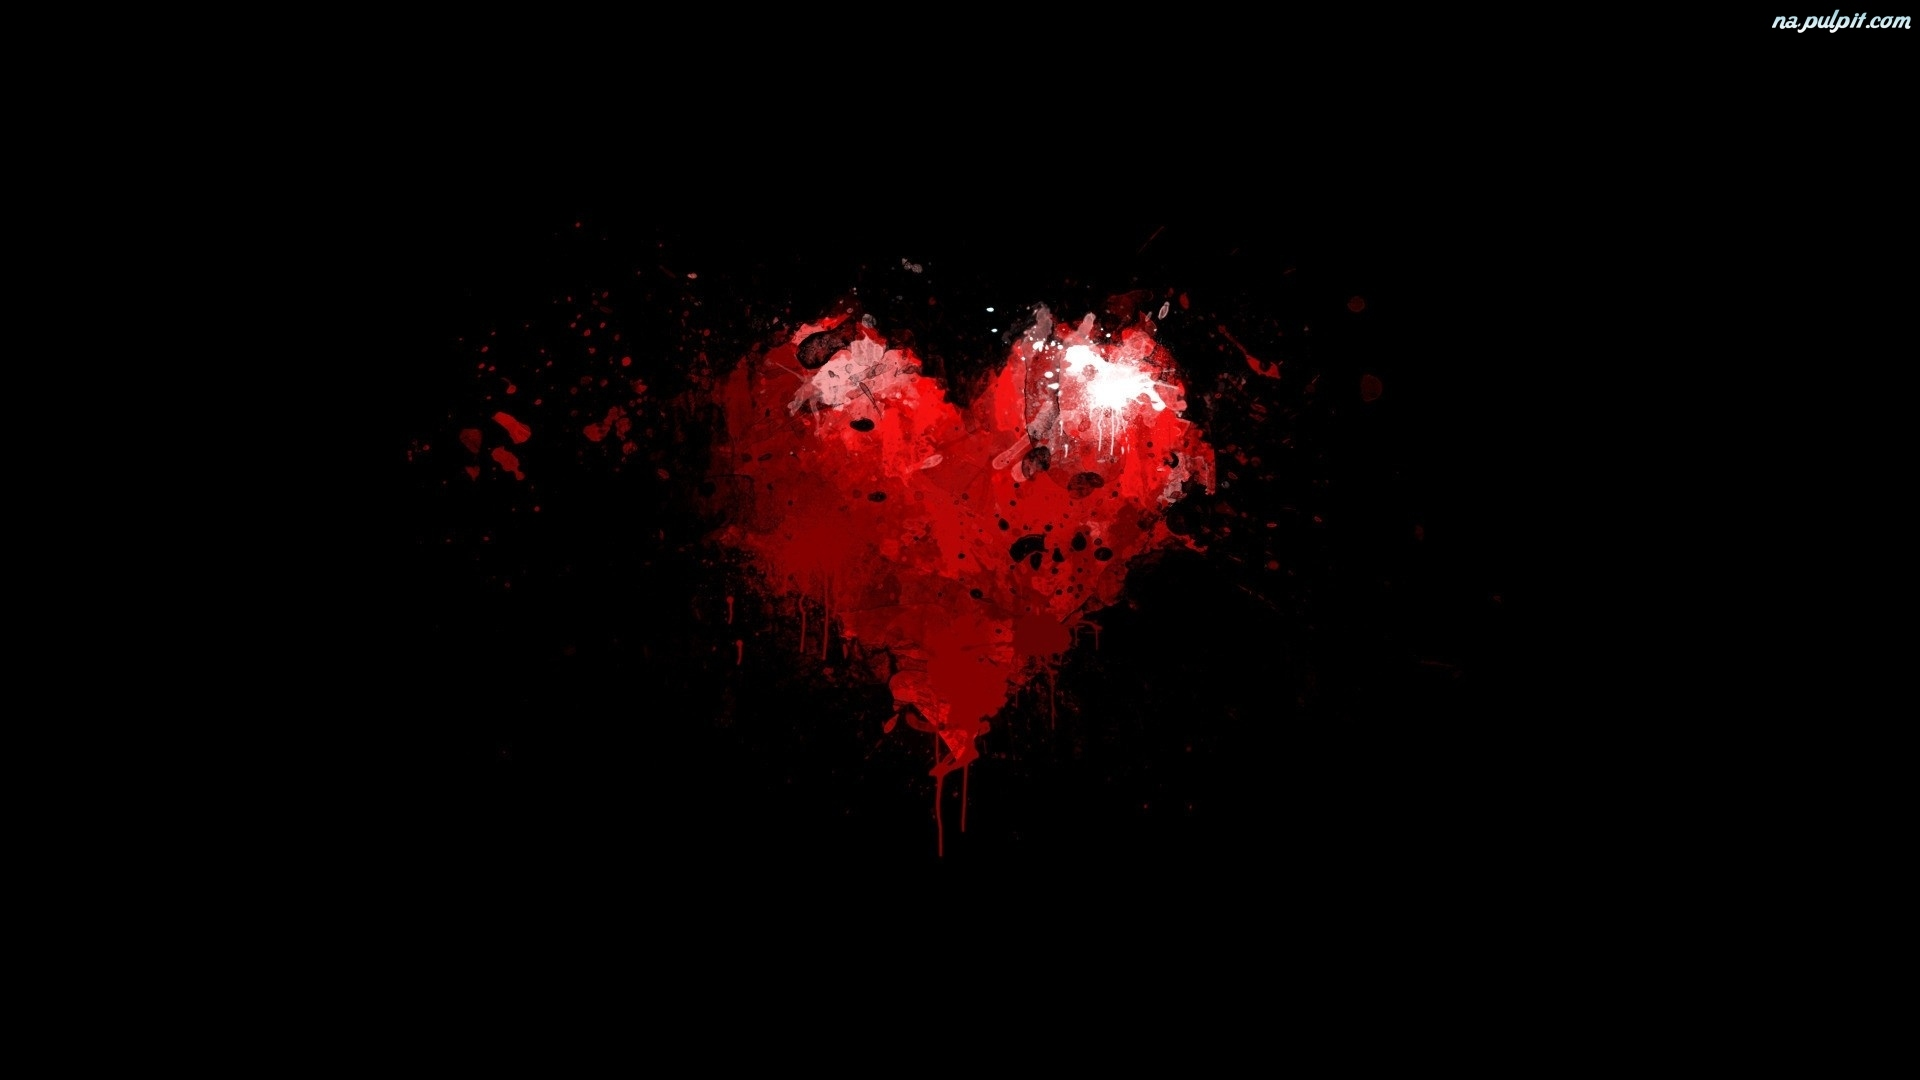 Abstract Wallpaper Black Hearts Blue 3d And Hd Wallpaper: Czerwone, Serce Na Pulpit